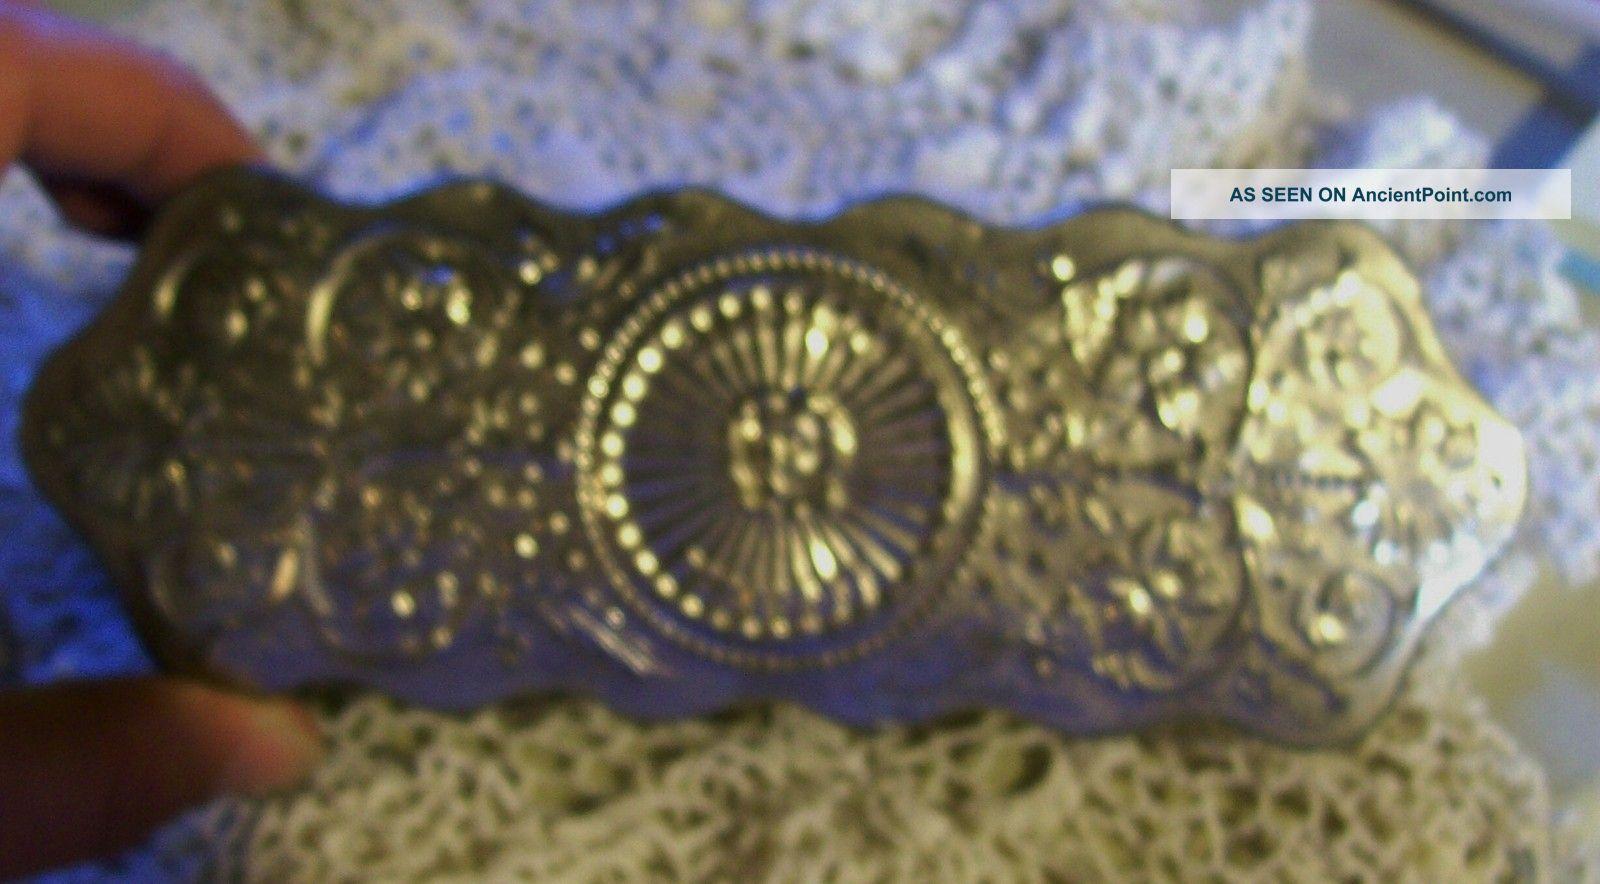 Antique Vanity Brush Silver Victorian Era Fancy Sunshine Polisher Dresser Ornate Brushes & Grooming Sets photo